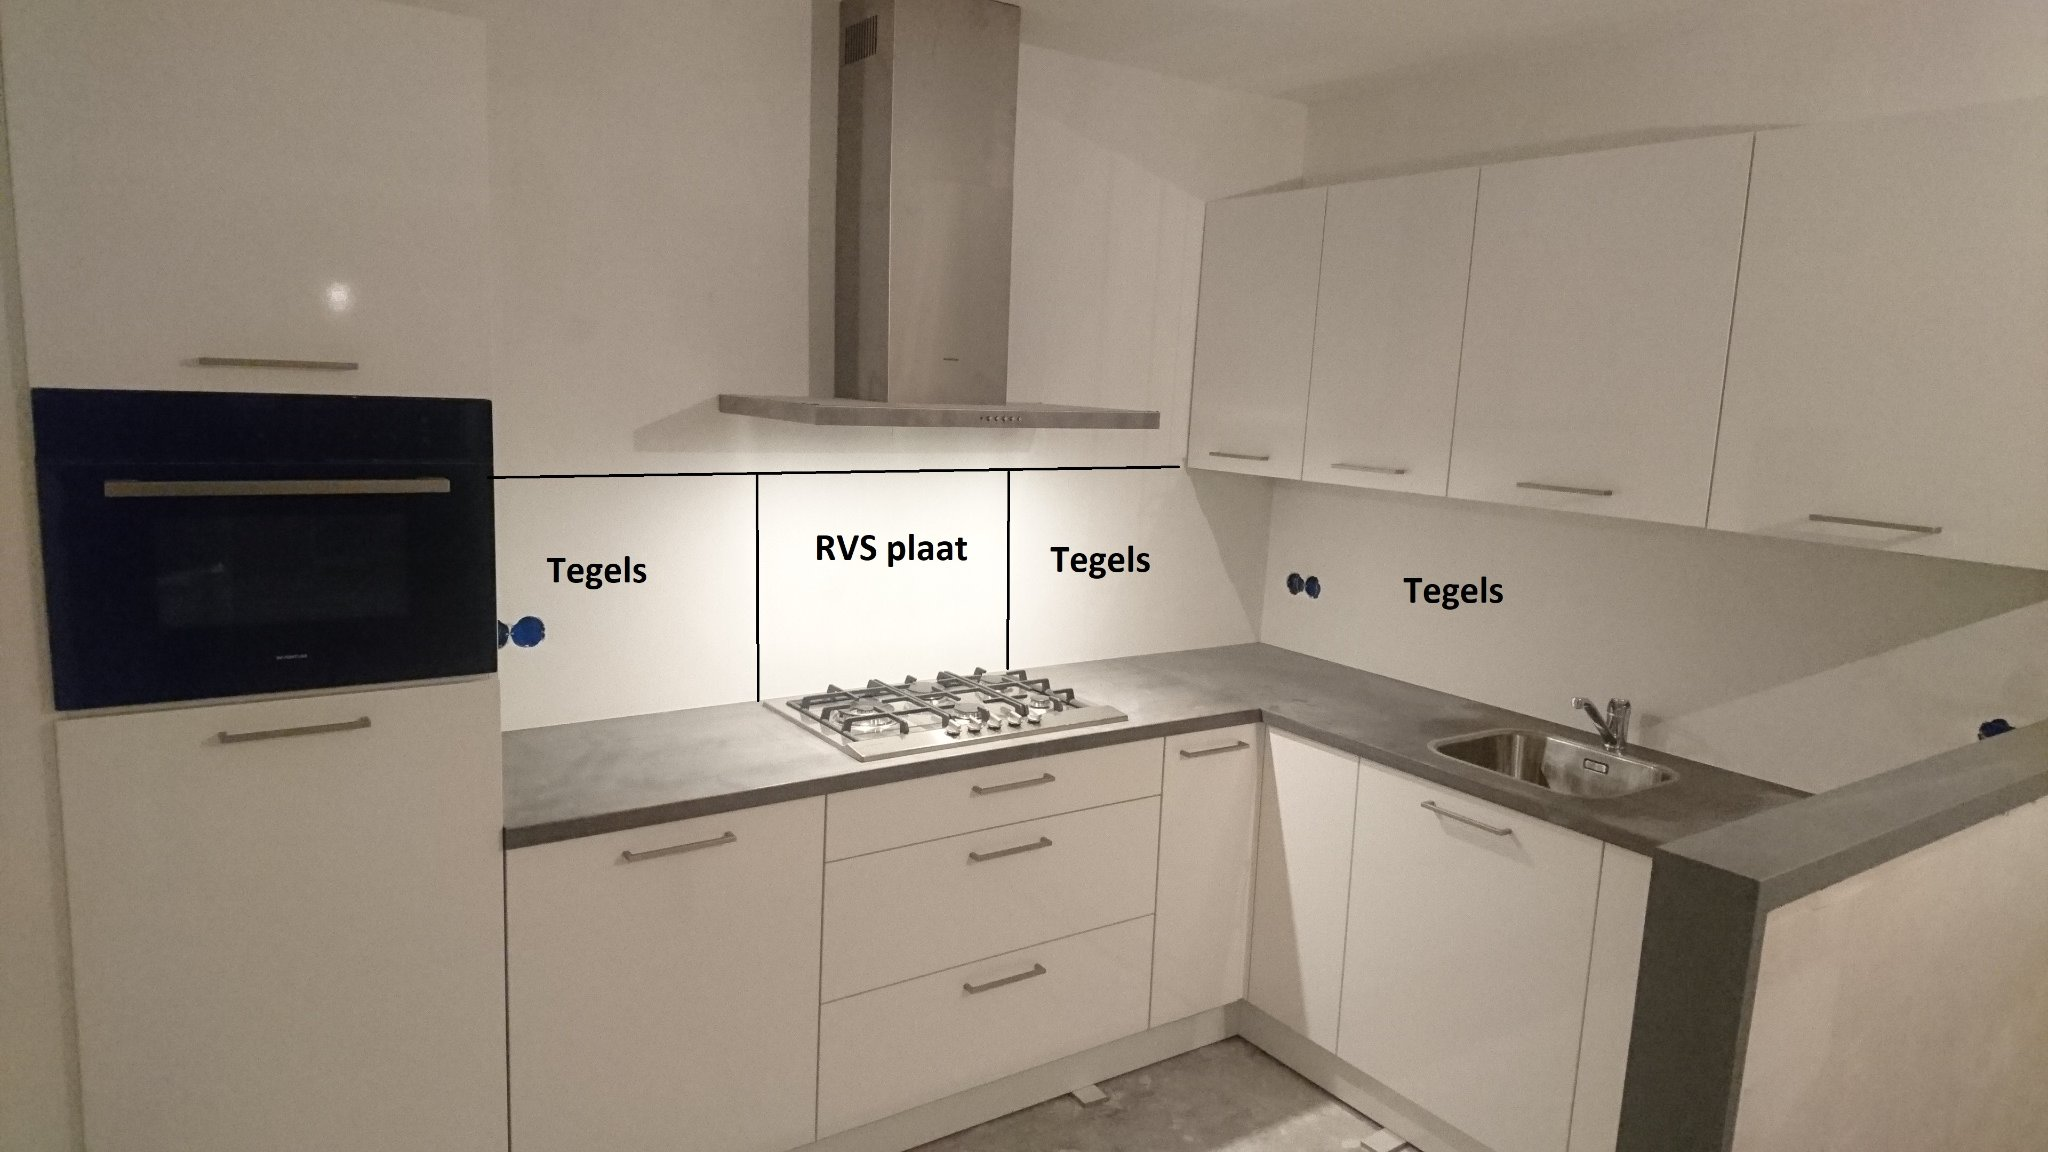 keuken tegels leiden : Tegelzetten Keuken Werkspot